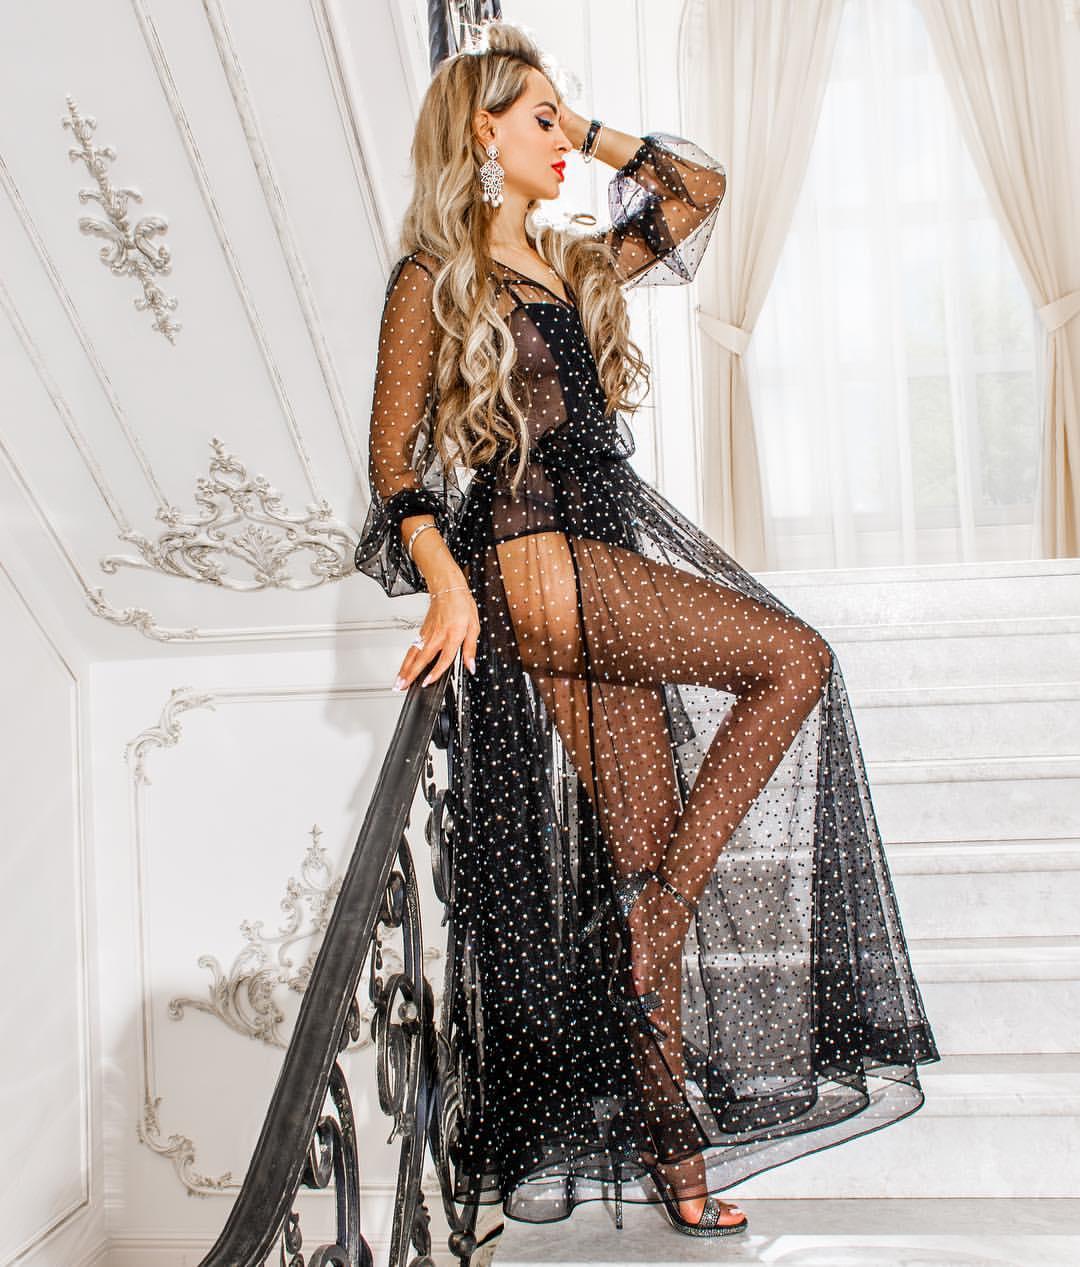 Голая Настя Калашникова